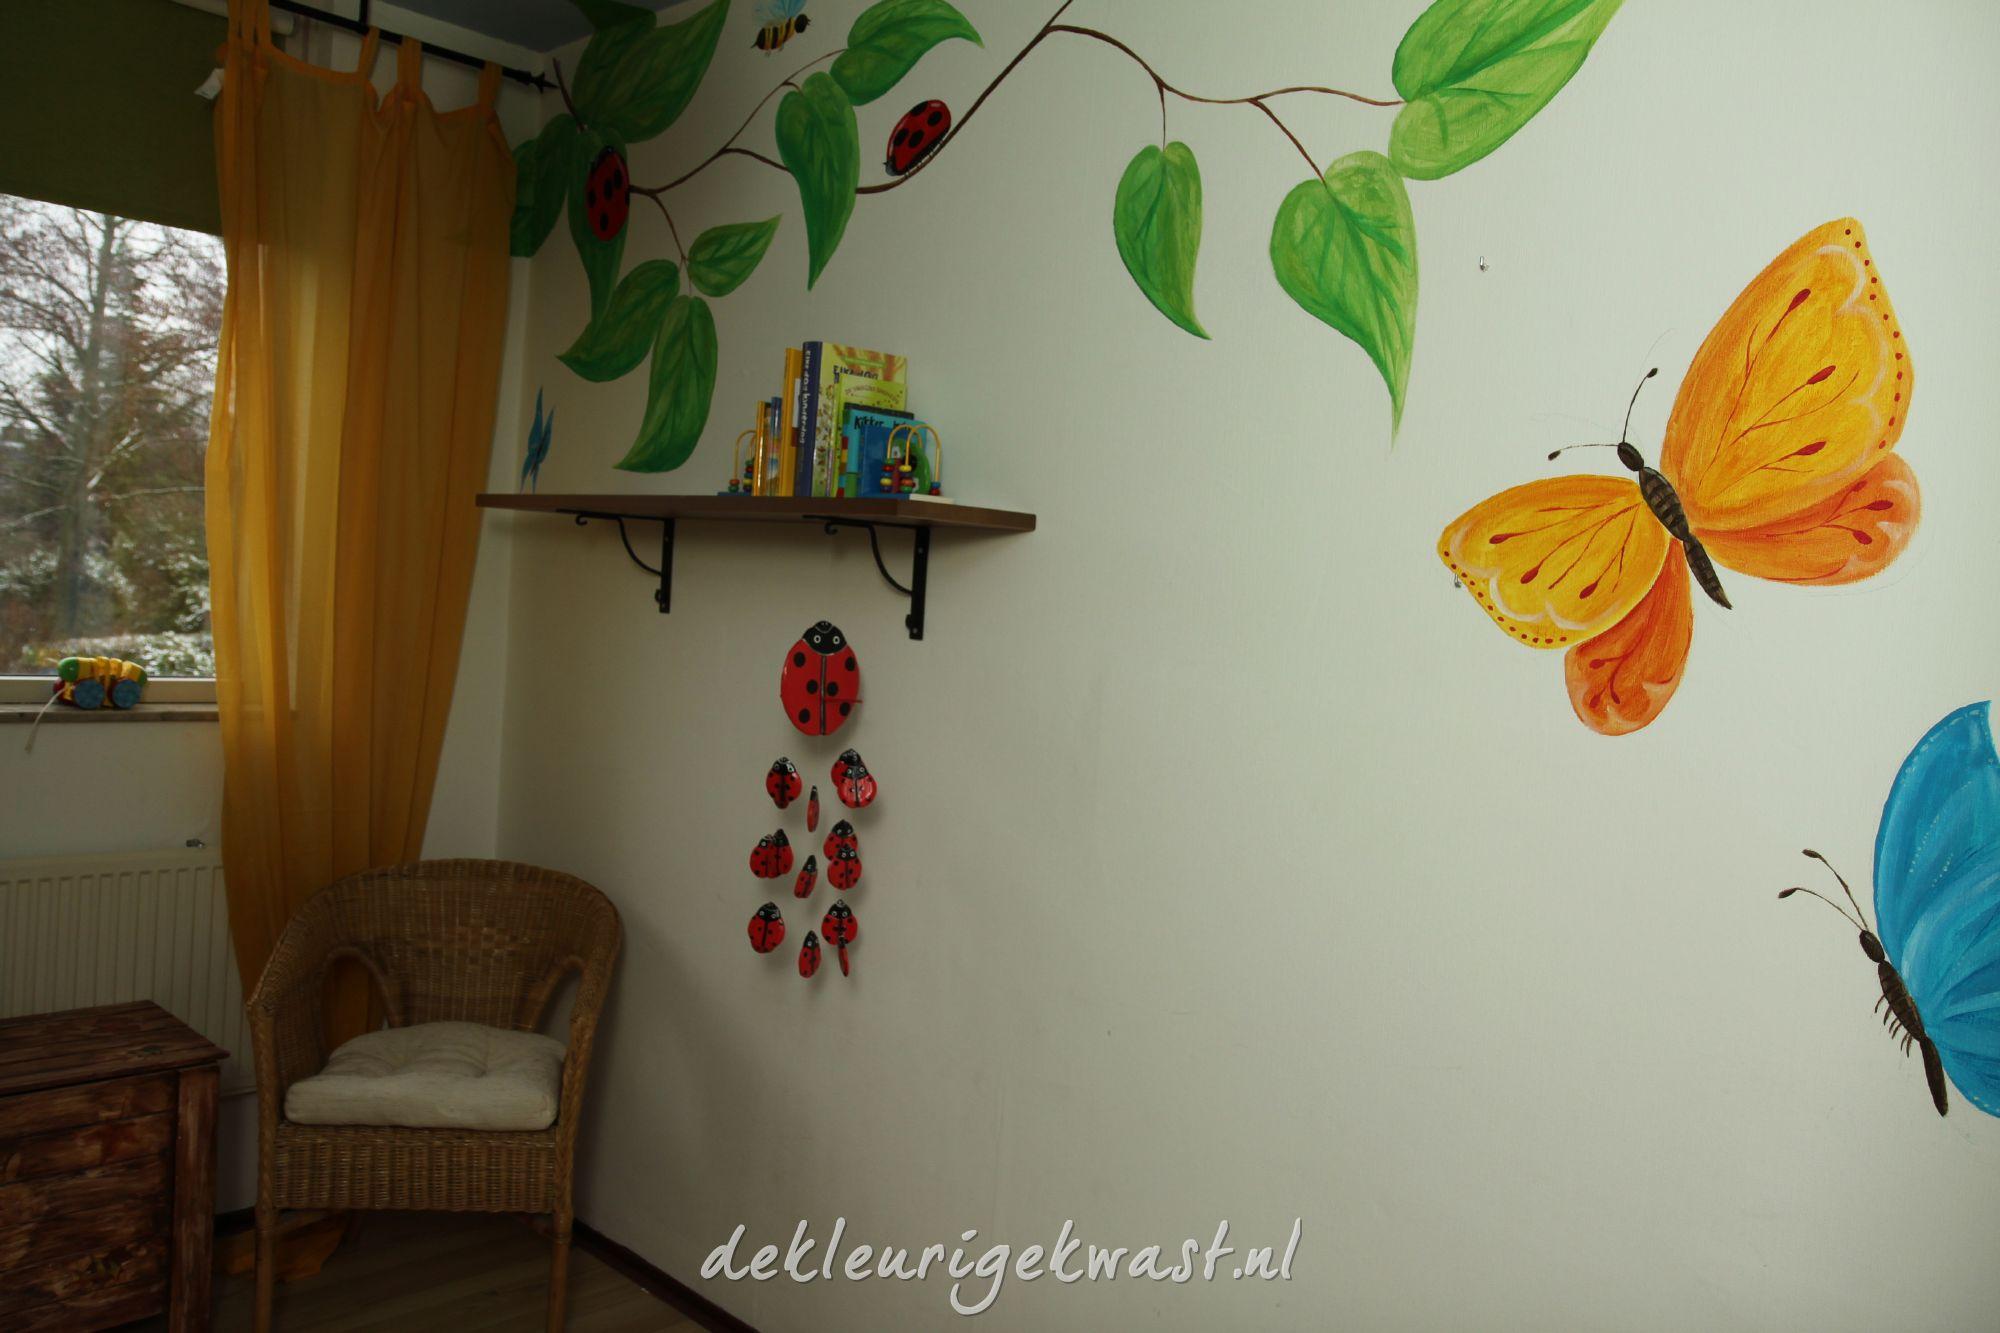 Kinderkamer Vlinder Compleet : Kinderkamers u de kleurige kwast